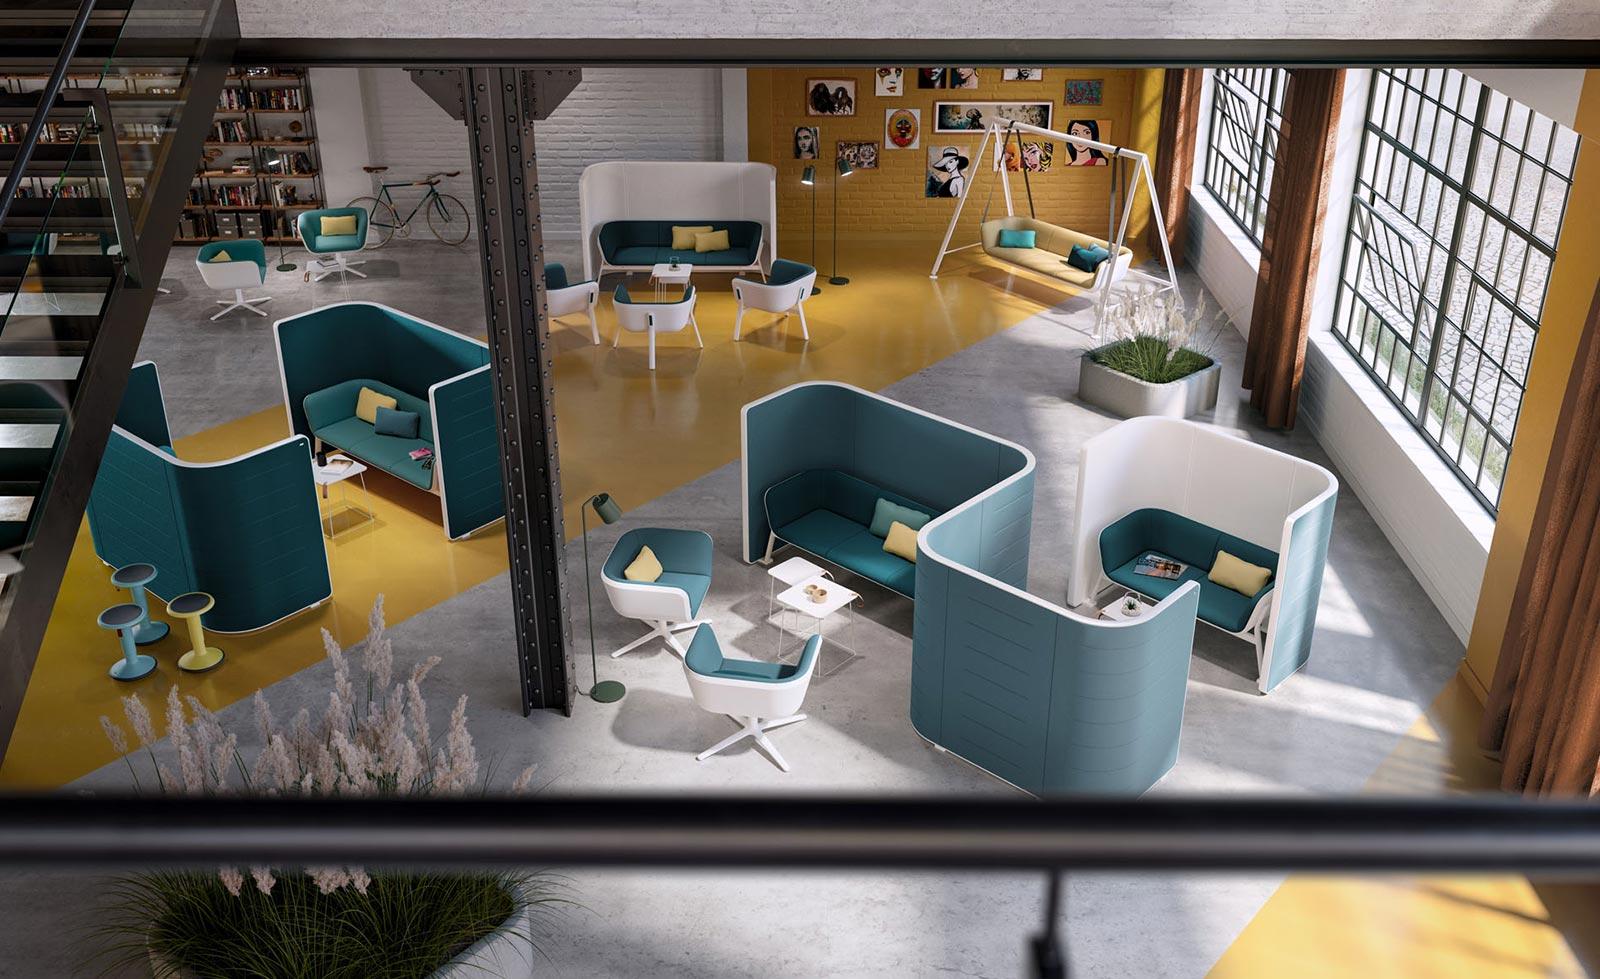 Think Furniture - Hybrid Office Design - Interstuhl Splaces